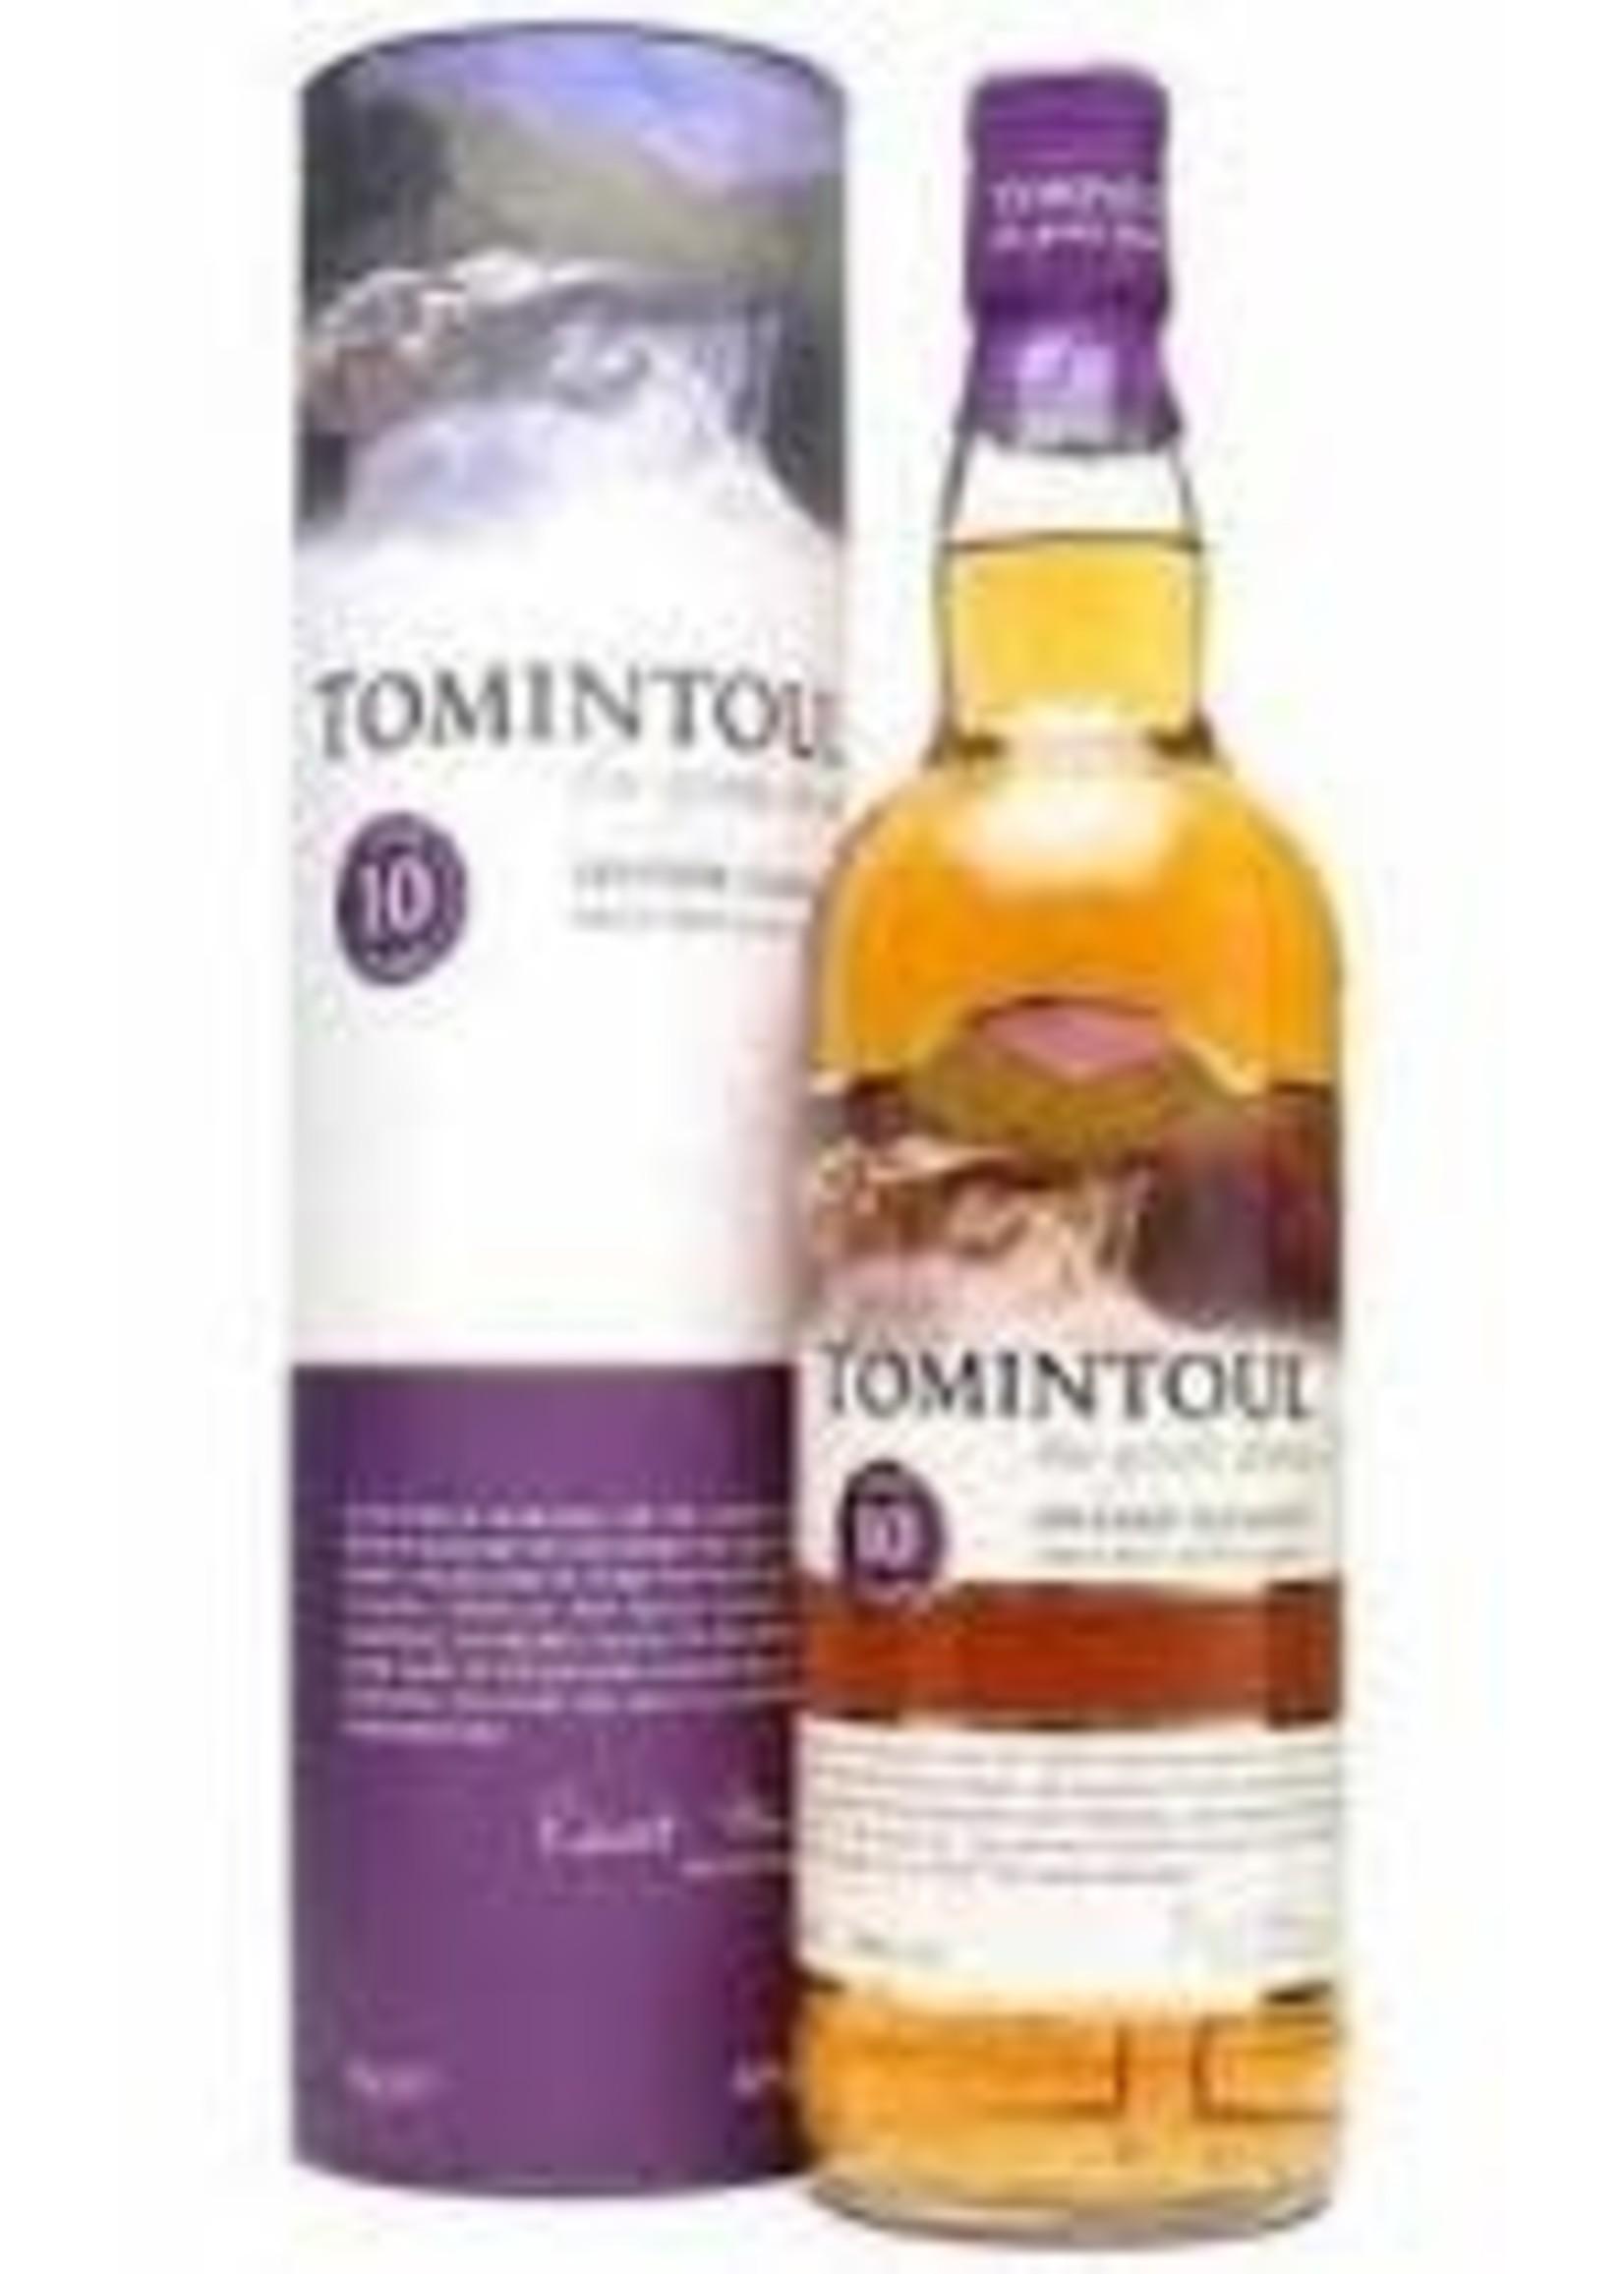 Tomintoul 10 Year Old Speyside Glenlivet Single Malt Scotch Whisky 750ml